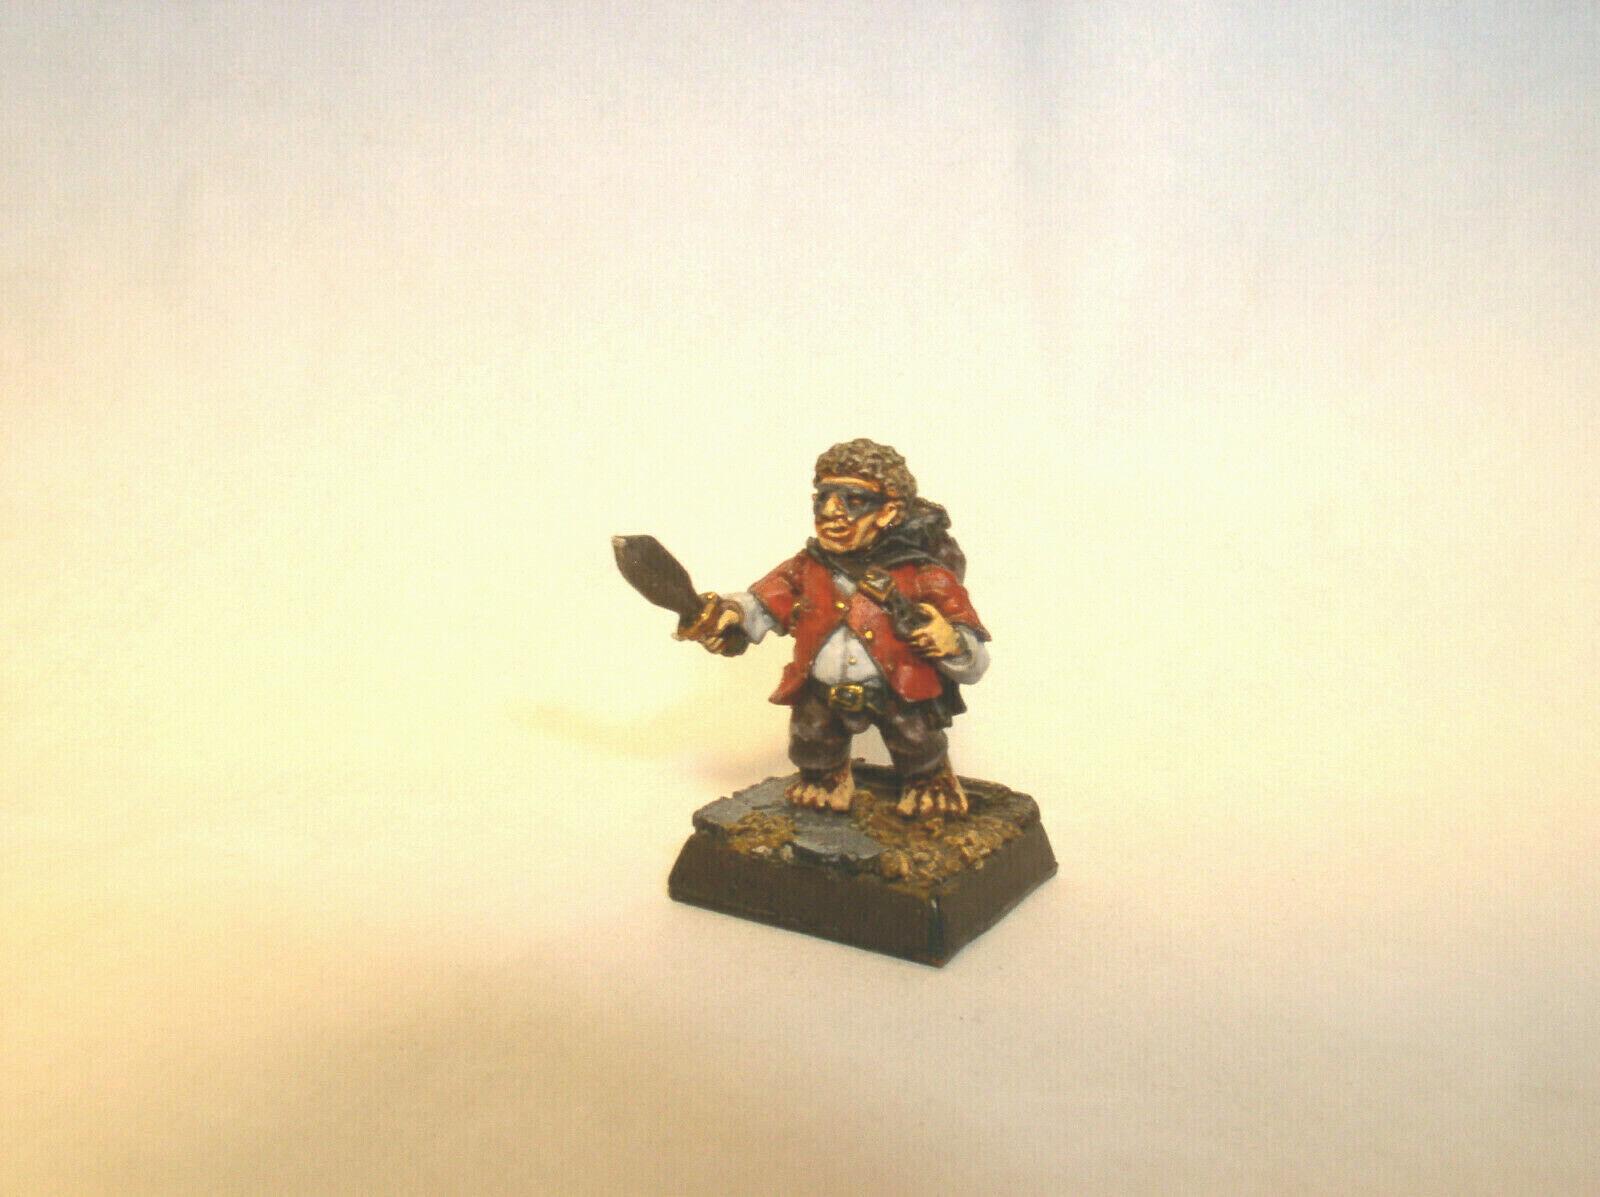 alto sconto Mordheim Mordheim Mordheim Halfling thief pro painted OOP Warhammer Citadel  negozio online